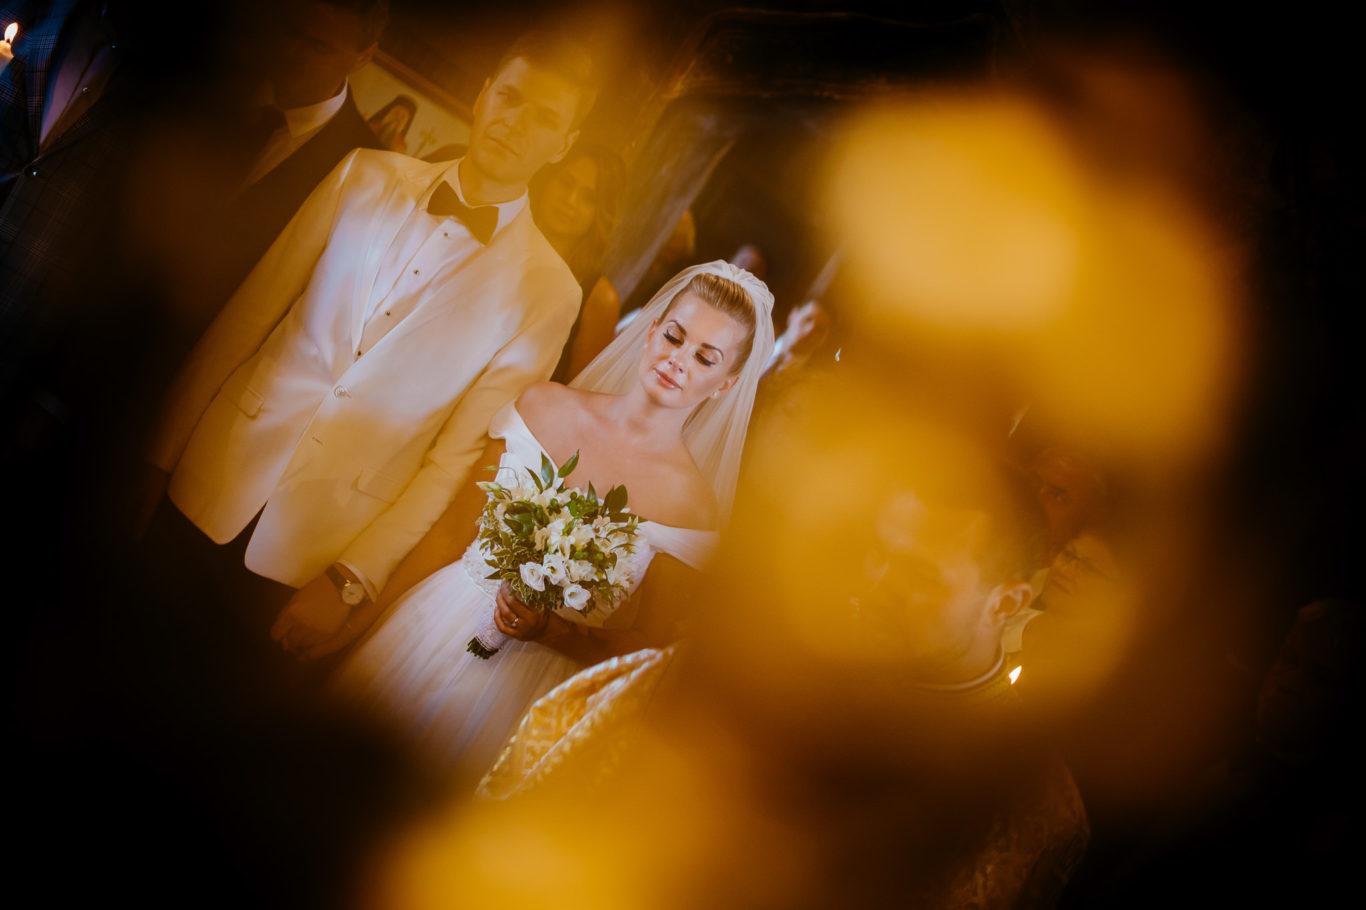 0259-fotoreportaj-nunta-conacul-maldar-cristina-stefan-fotograf-ciprian-dumitrescu-cd2_3004